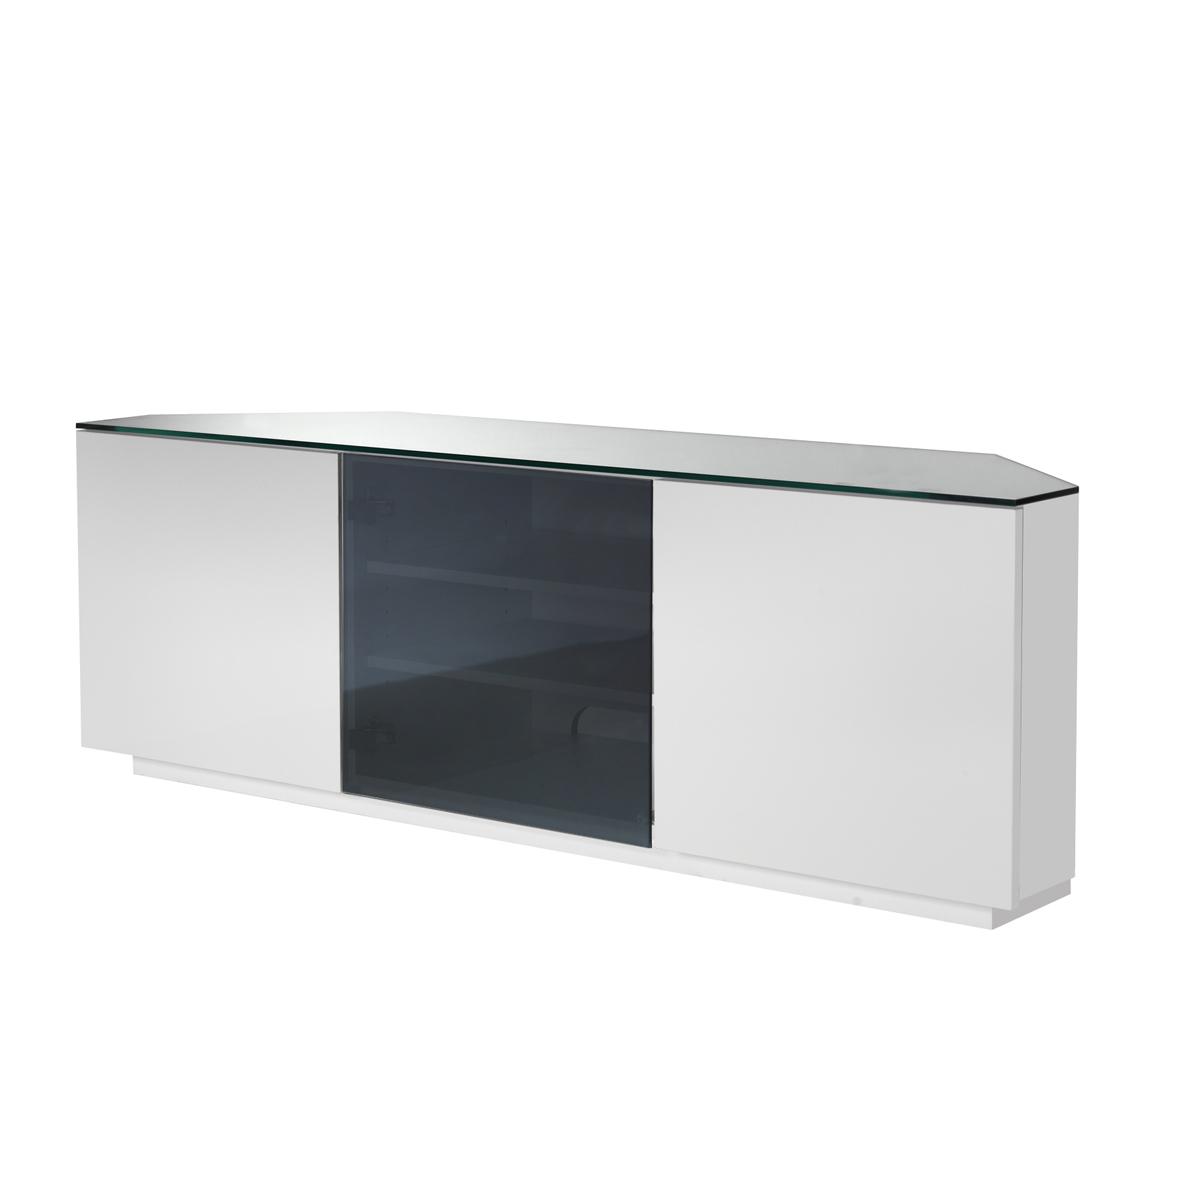 Ukcf Milan White Gloss & Black Glass Corner Tv Stand 150Cm Within Favorite White High Gloss Corner Tv Unit (Gallery 5 of 20)